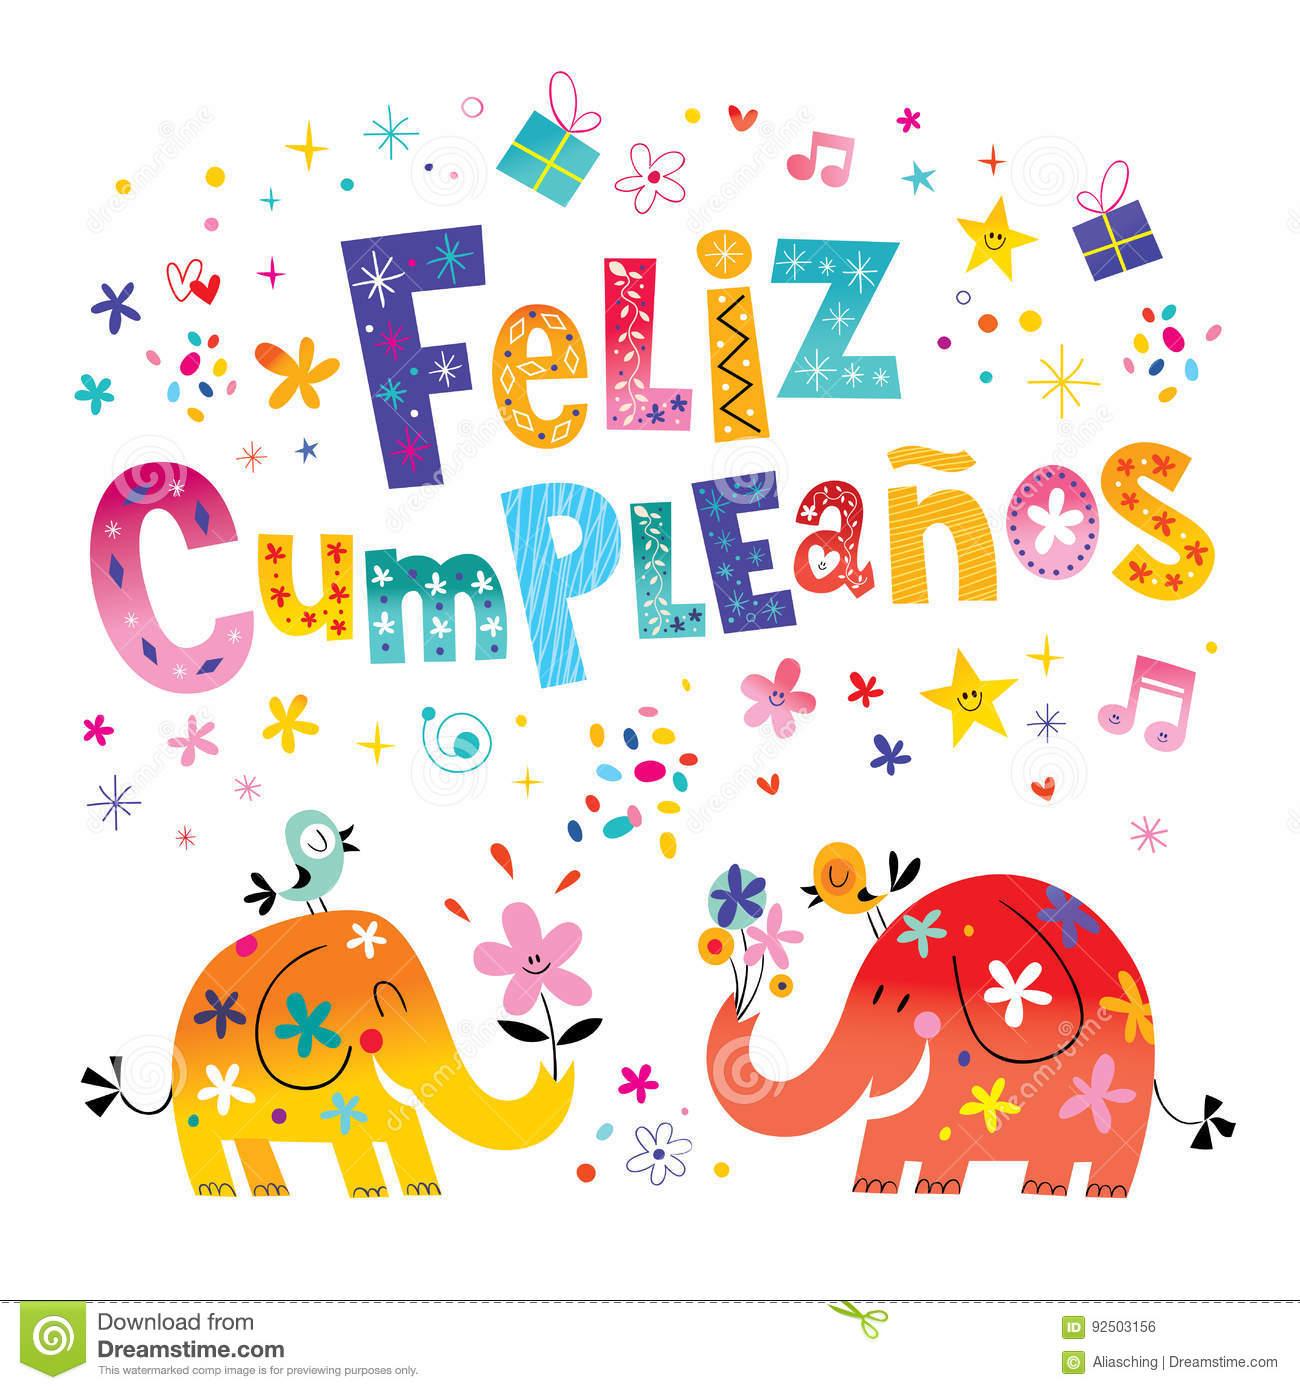 Feliz Cumpleanos Happy Birthday In Spanish Greeting Card Stock - Free Printable Happy Birthday Cards In Spanish